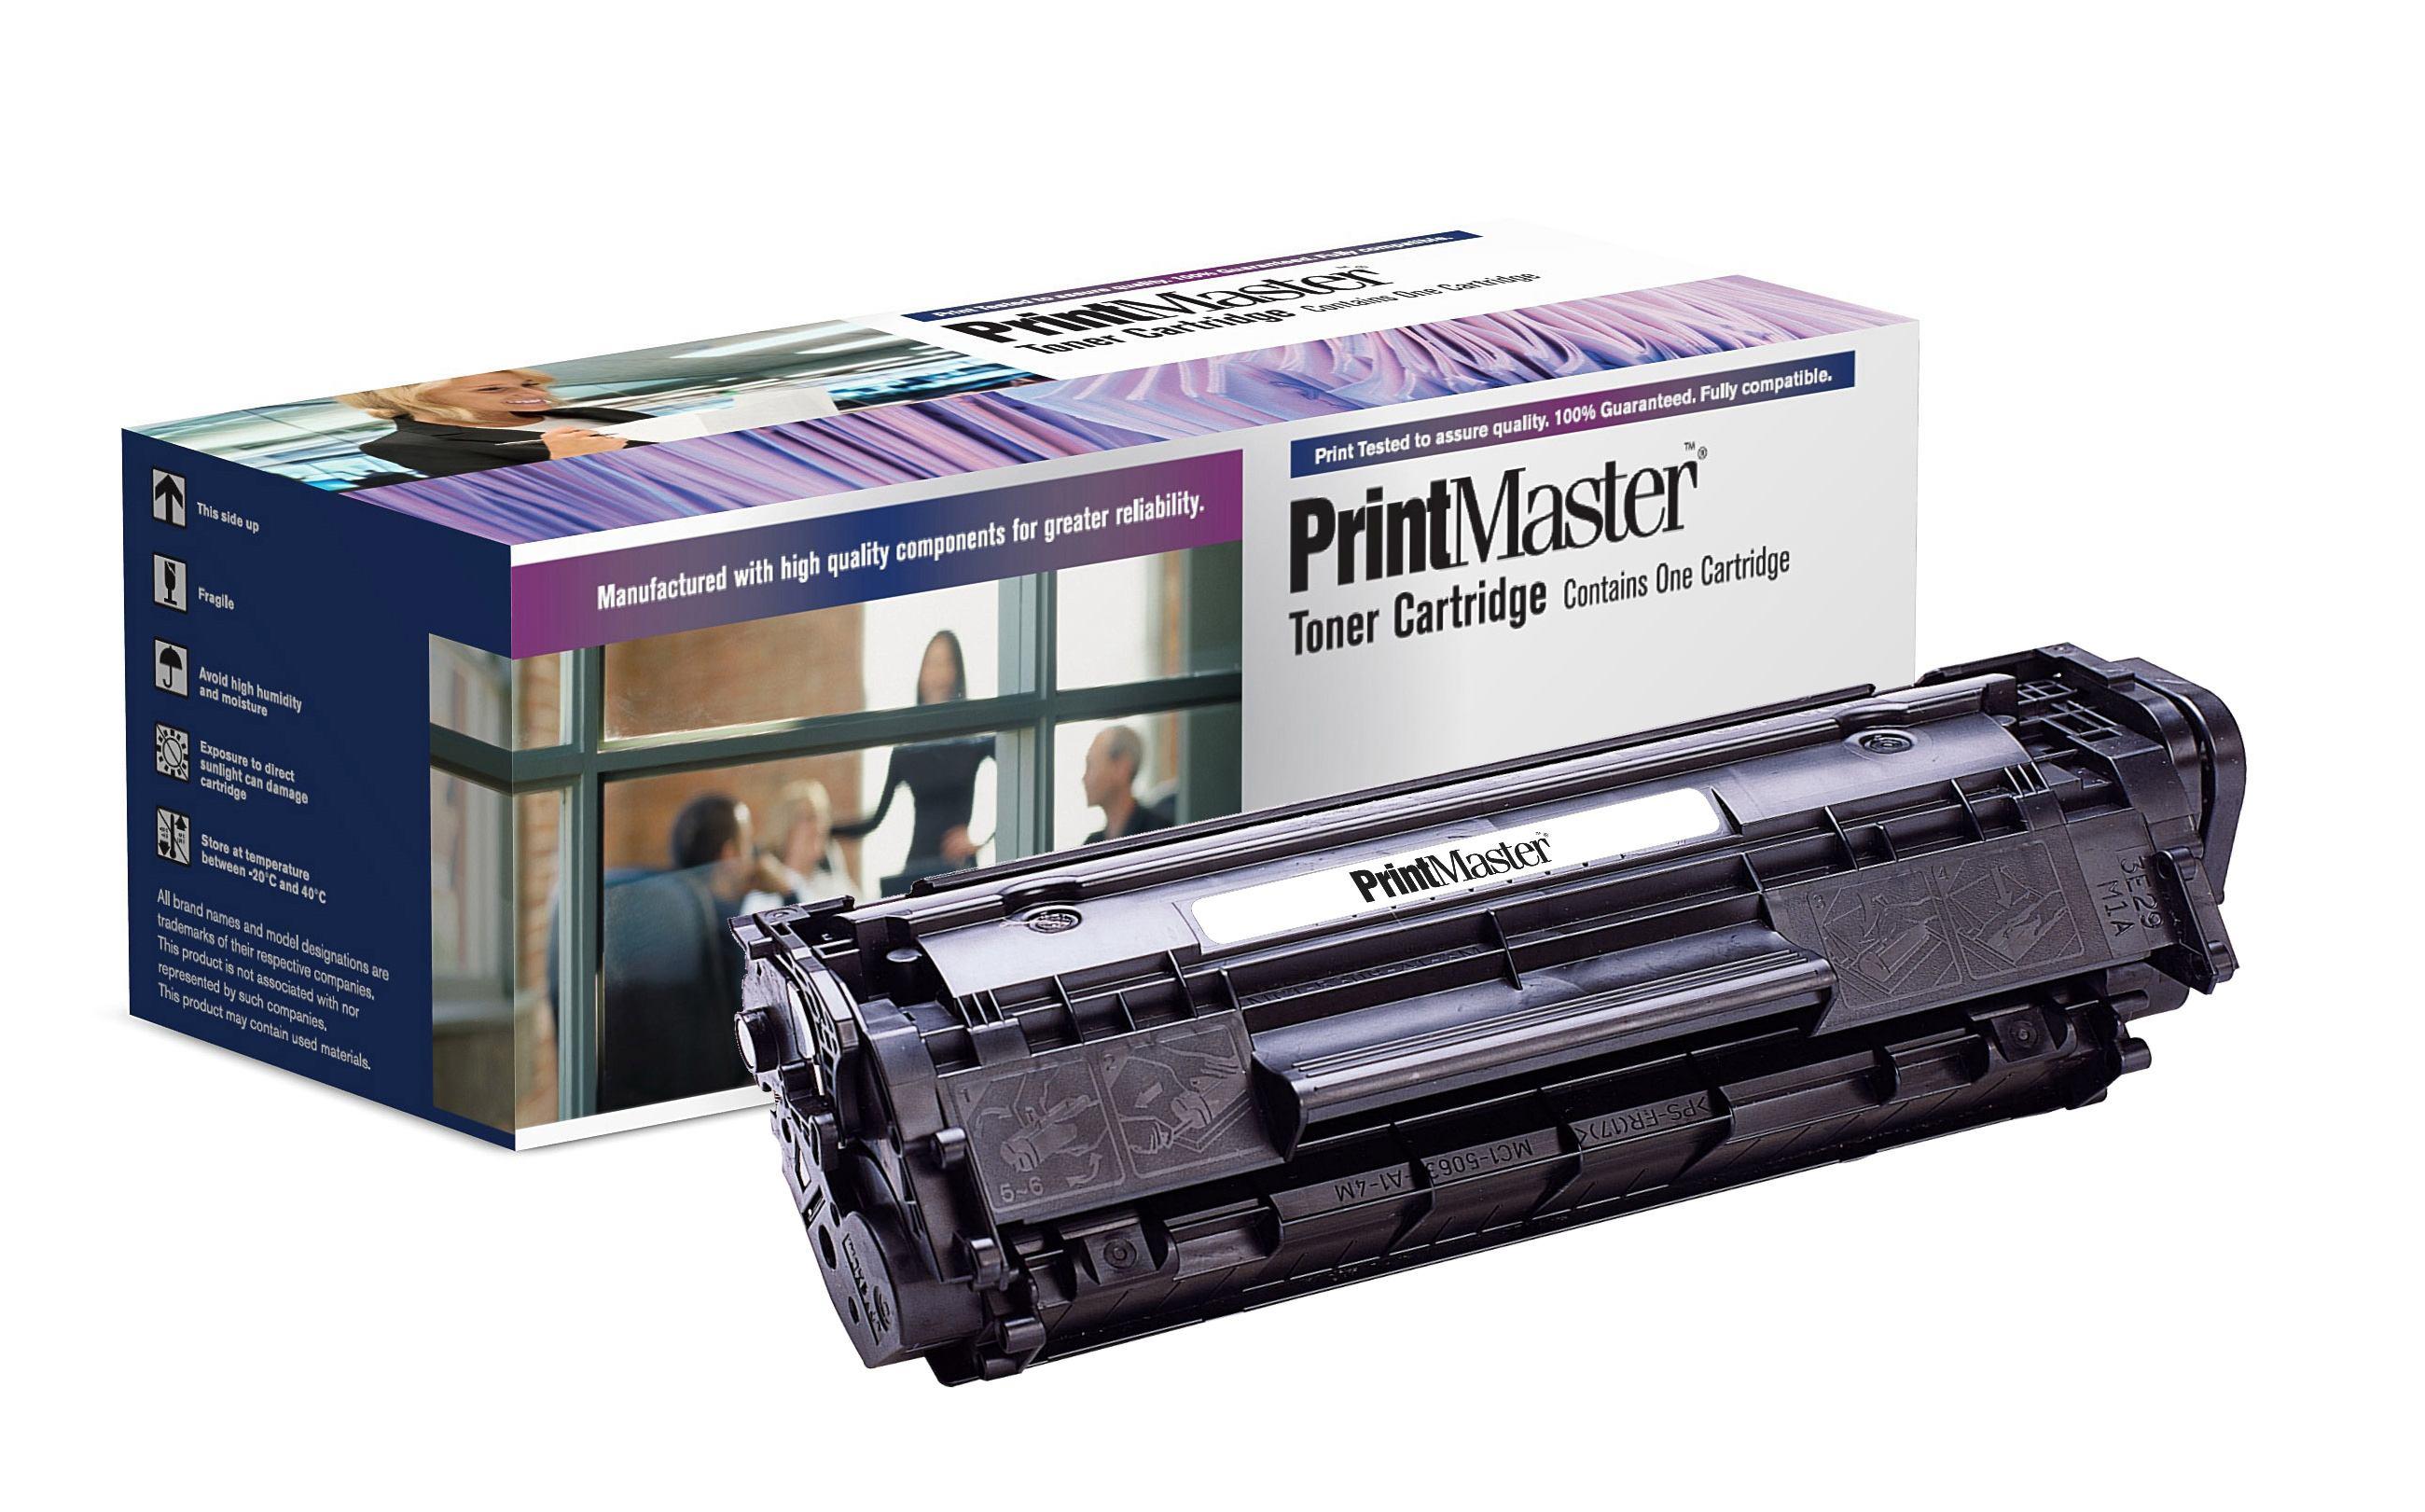 PrintMaster L100/120 Laser Toner FX10